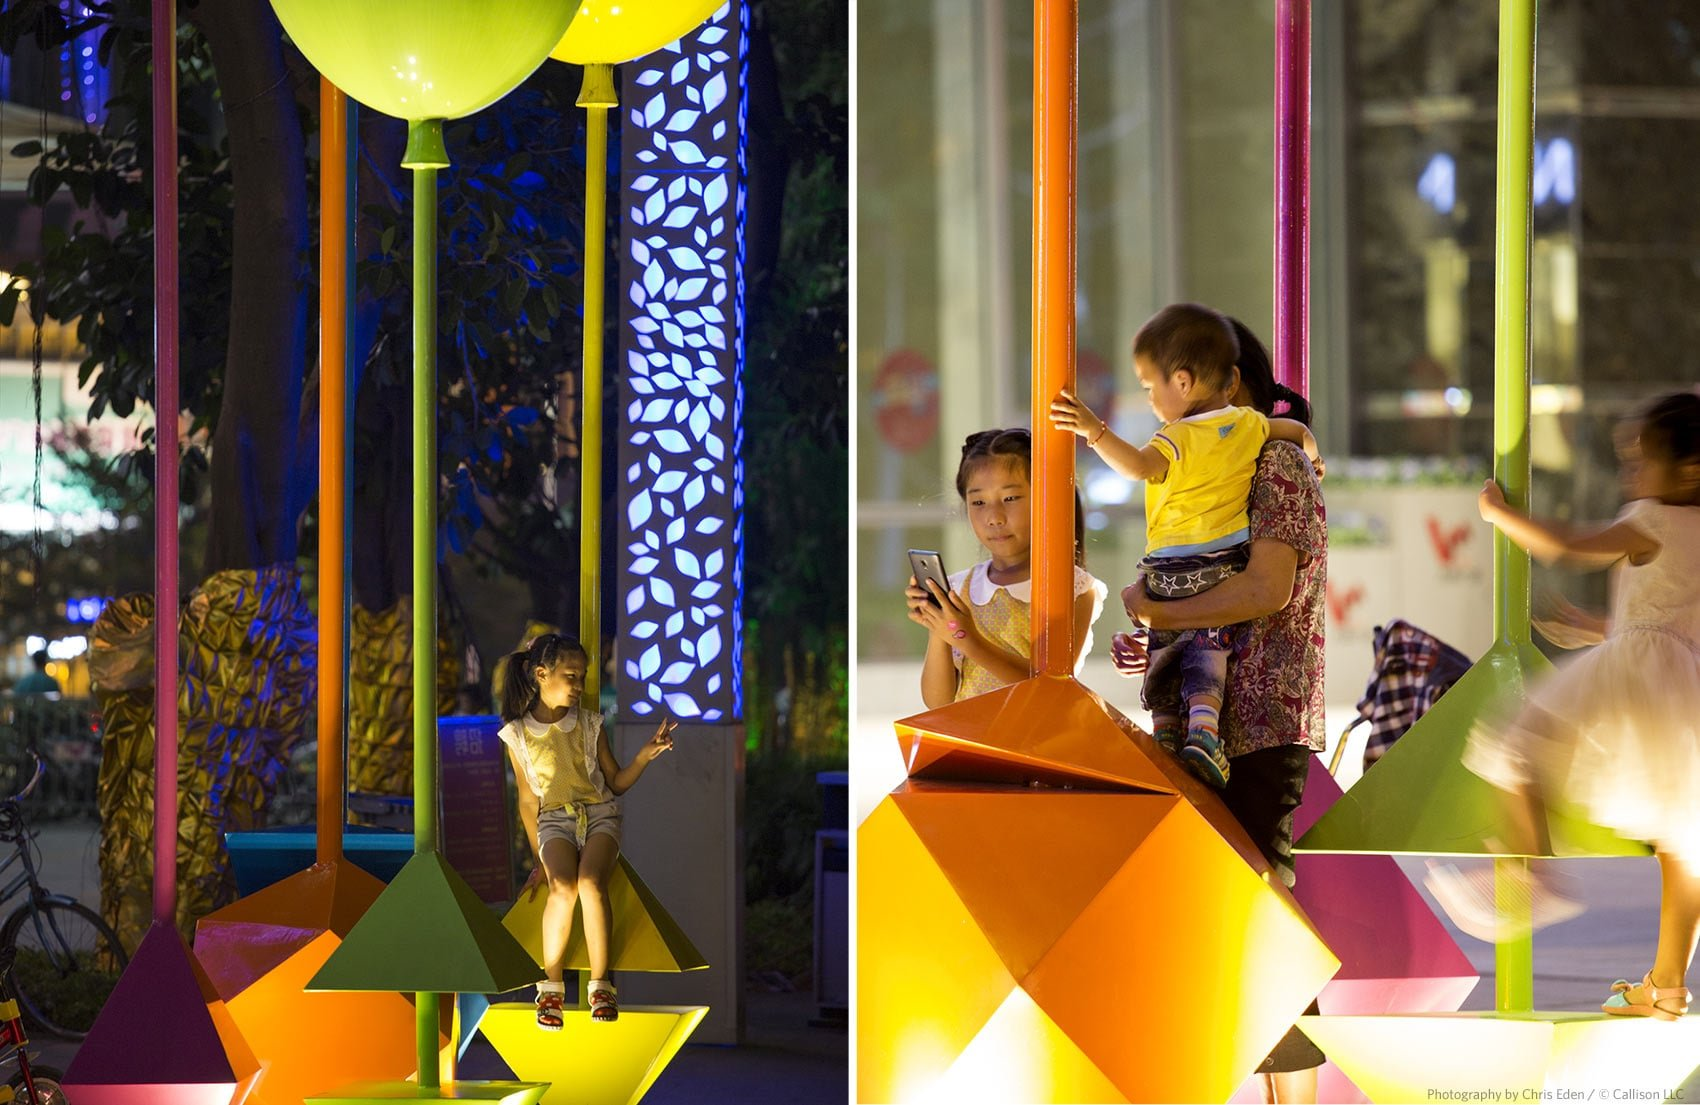 Vanke - Shen Zen, China - Interaction with design